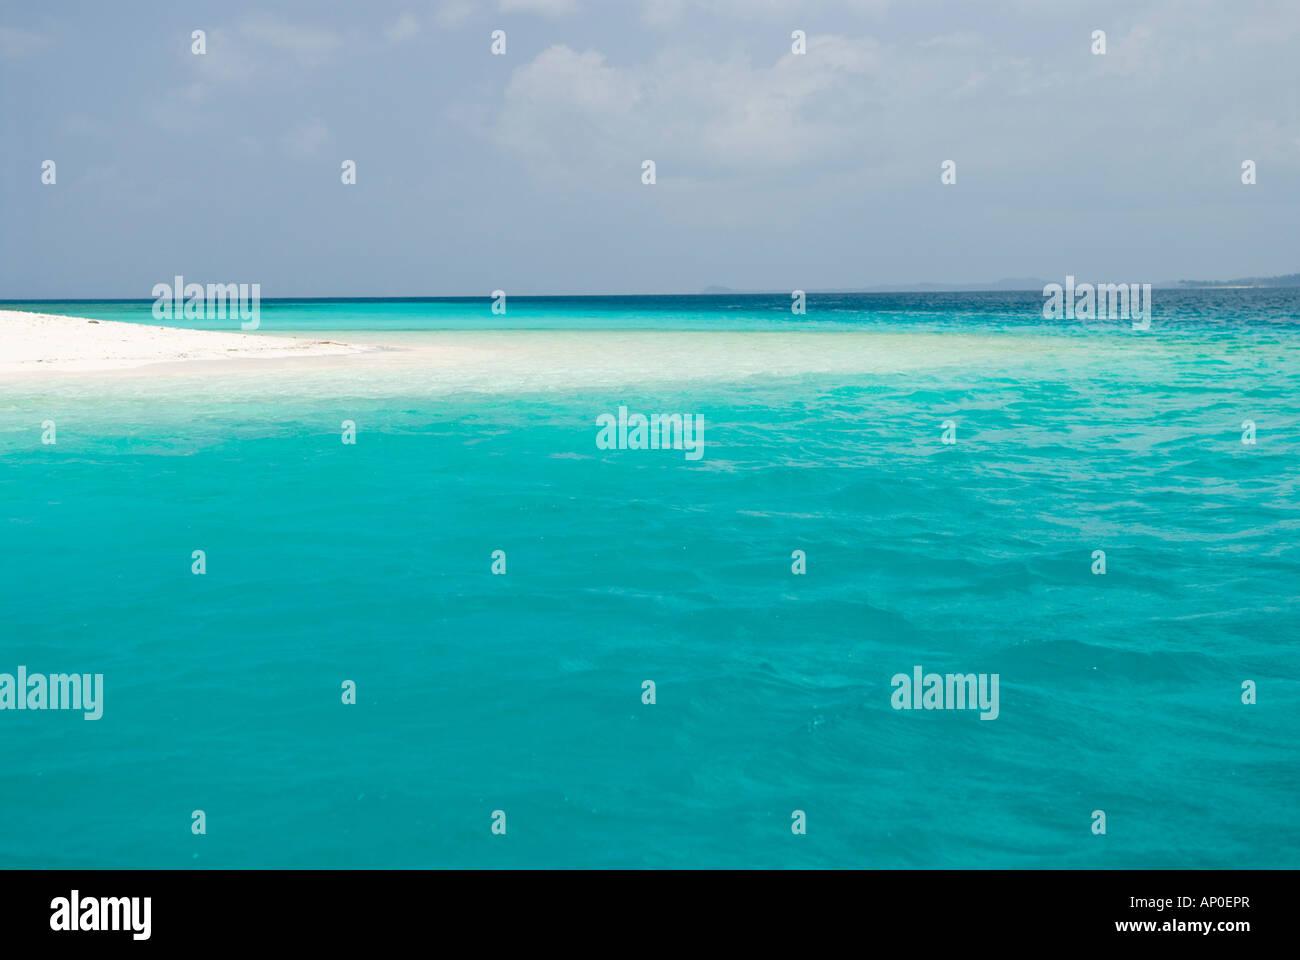 Pulau Pittojat Mentawai Islands Indonesia - Stock Image